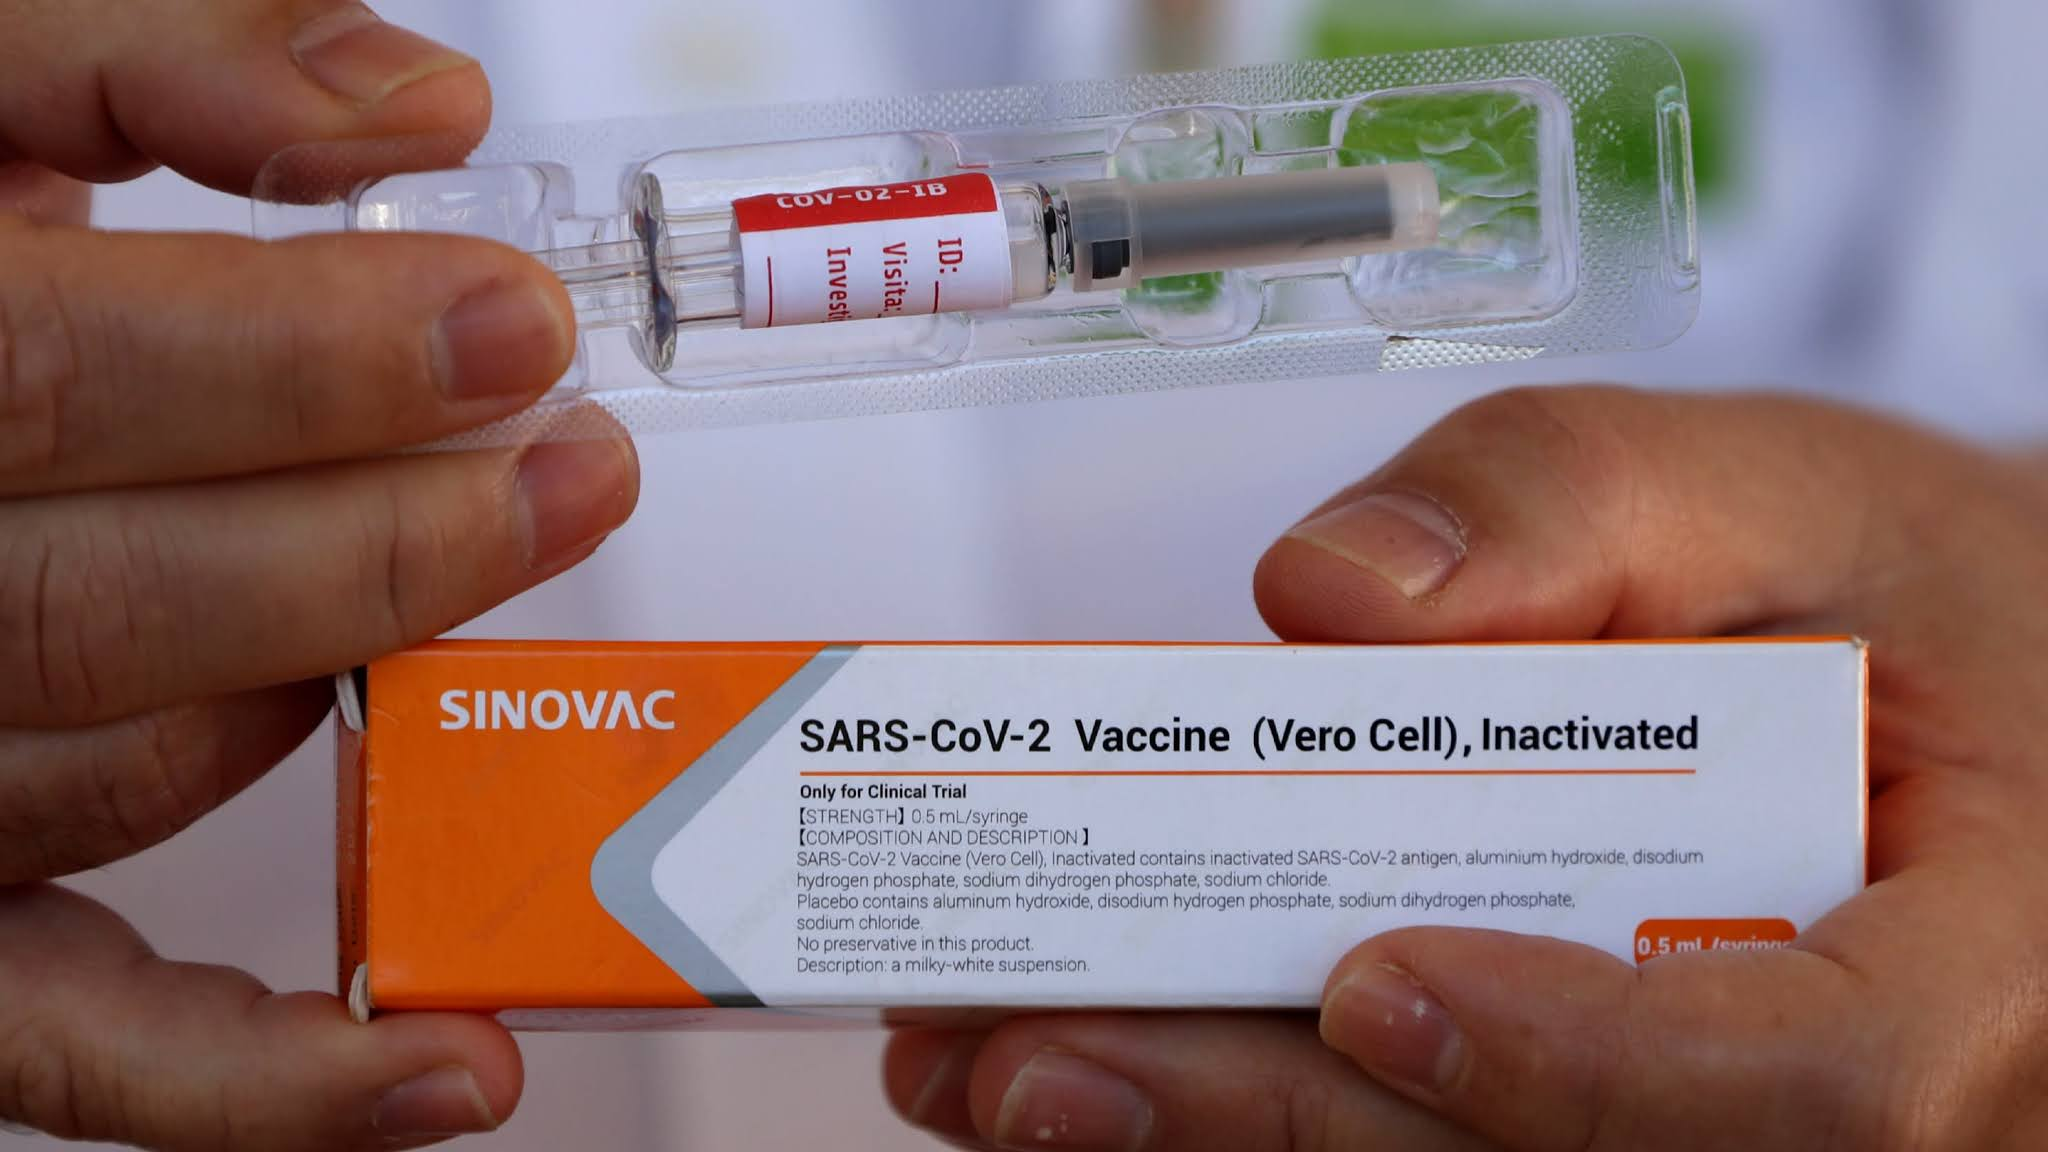 Vaksin produksi Sinovac Biotech Ltd.